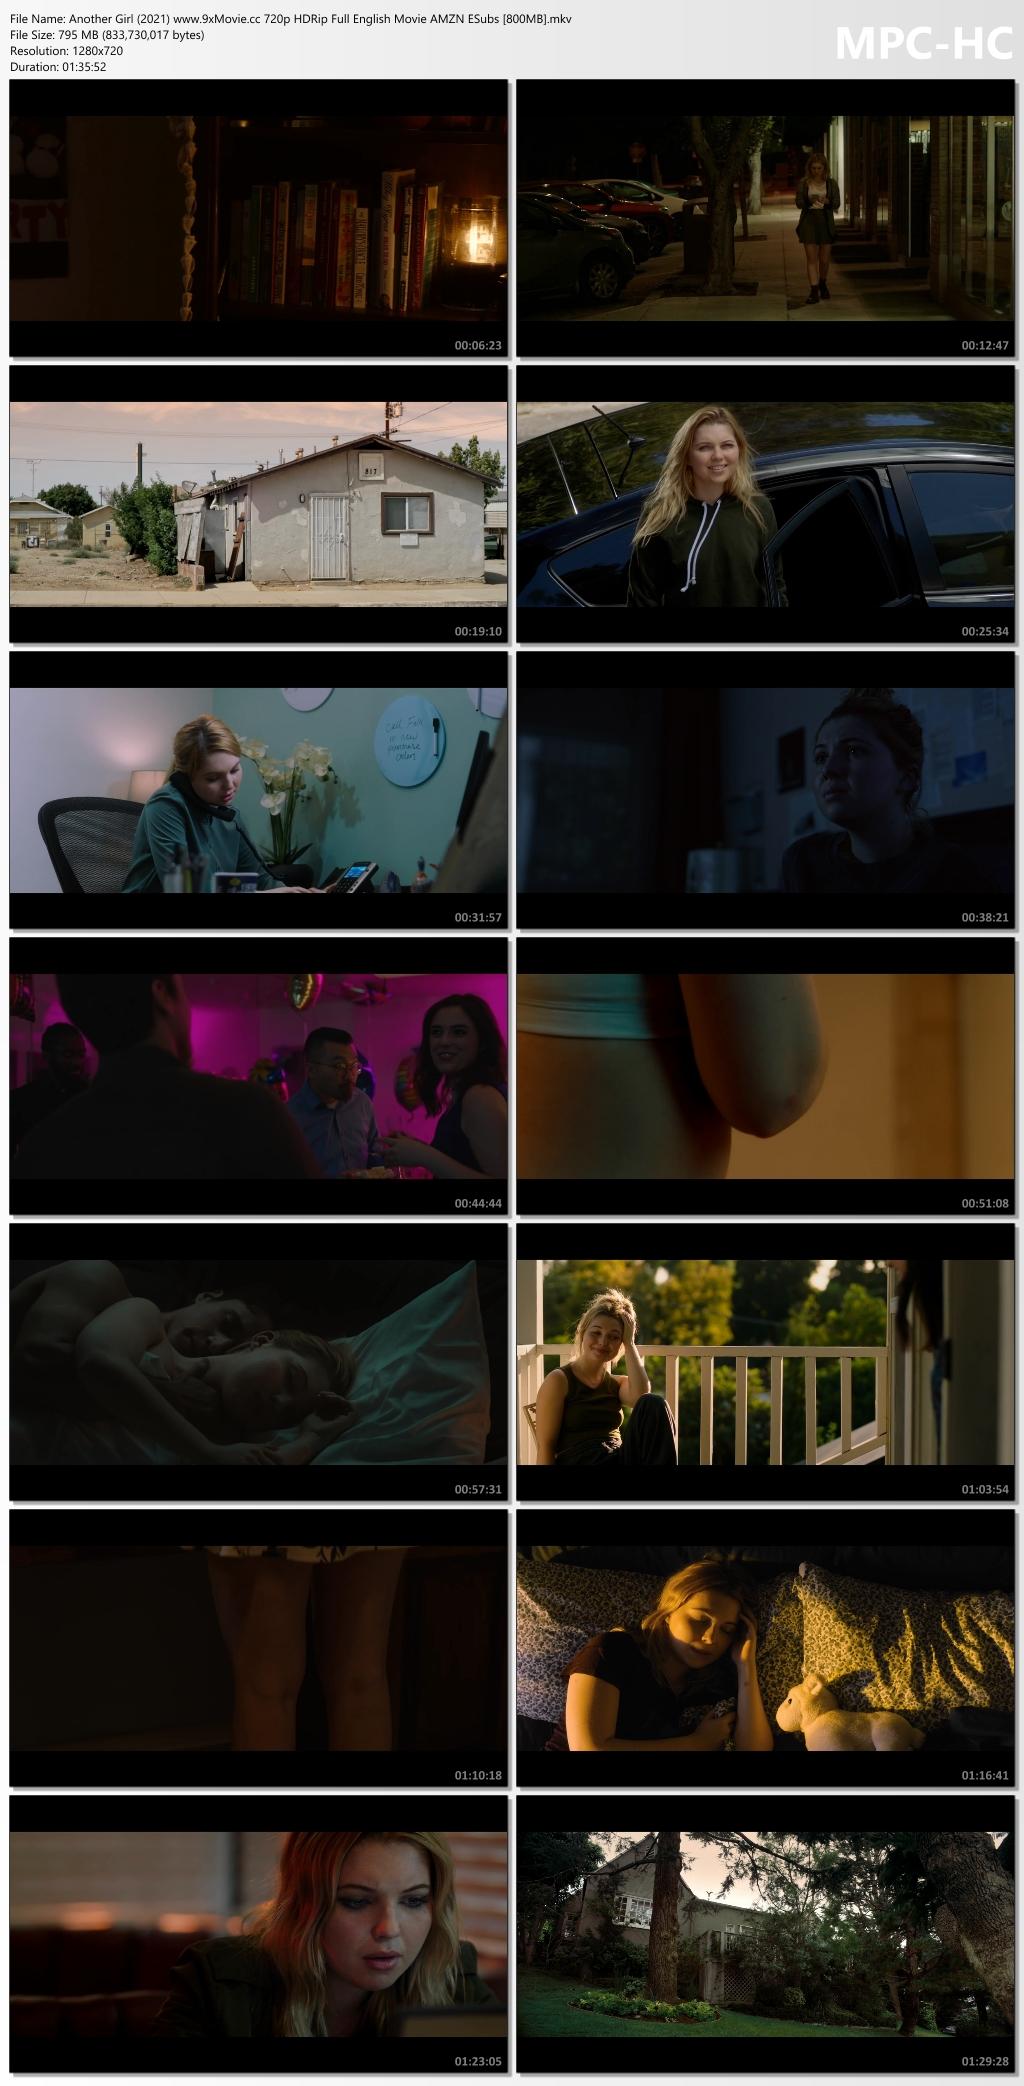 Another-Girl-2021-www-9x-Movie-cc-720p-HDRip-Full-English-Movie-AMZN-ESubs-800-MB-mkv